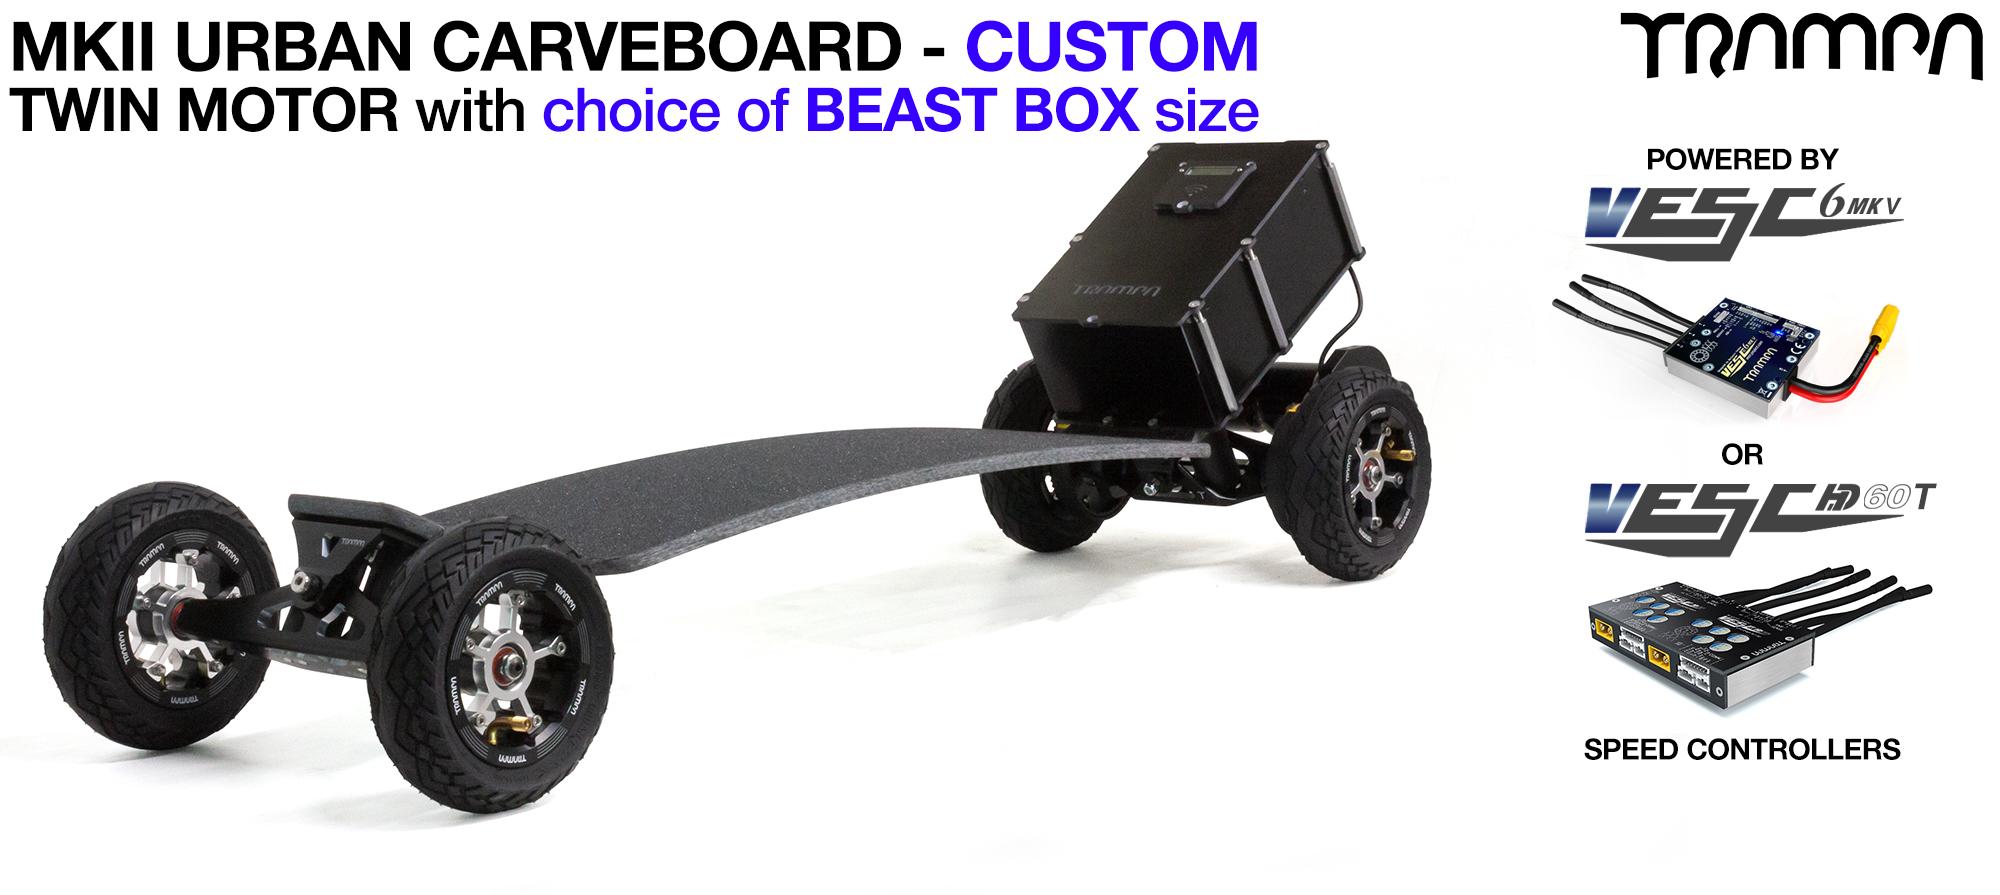 MkII TWIN Motor TRAMPA Electric URBAN Carveboard with 16A BEAST Box, VESC MKIII & OFF-SET MEGASTAR Wheels as standard